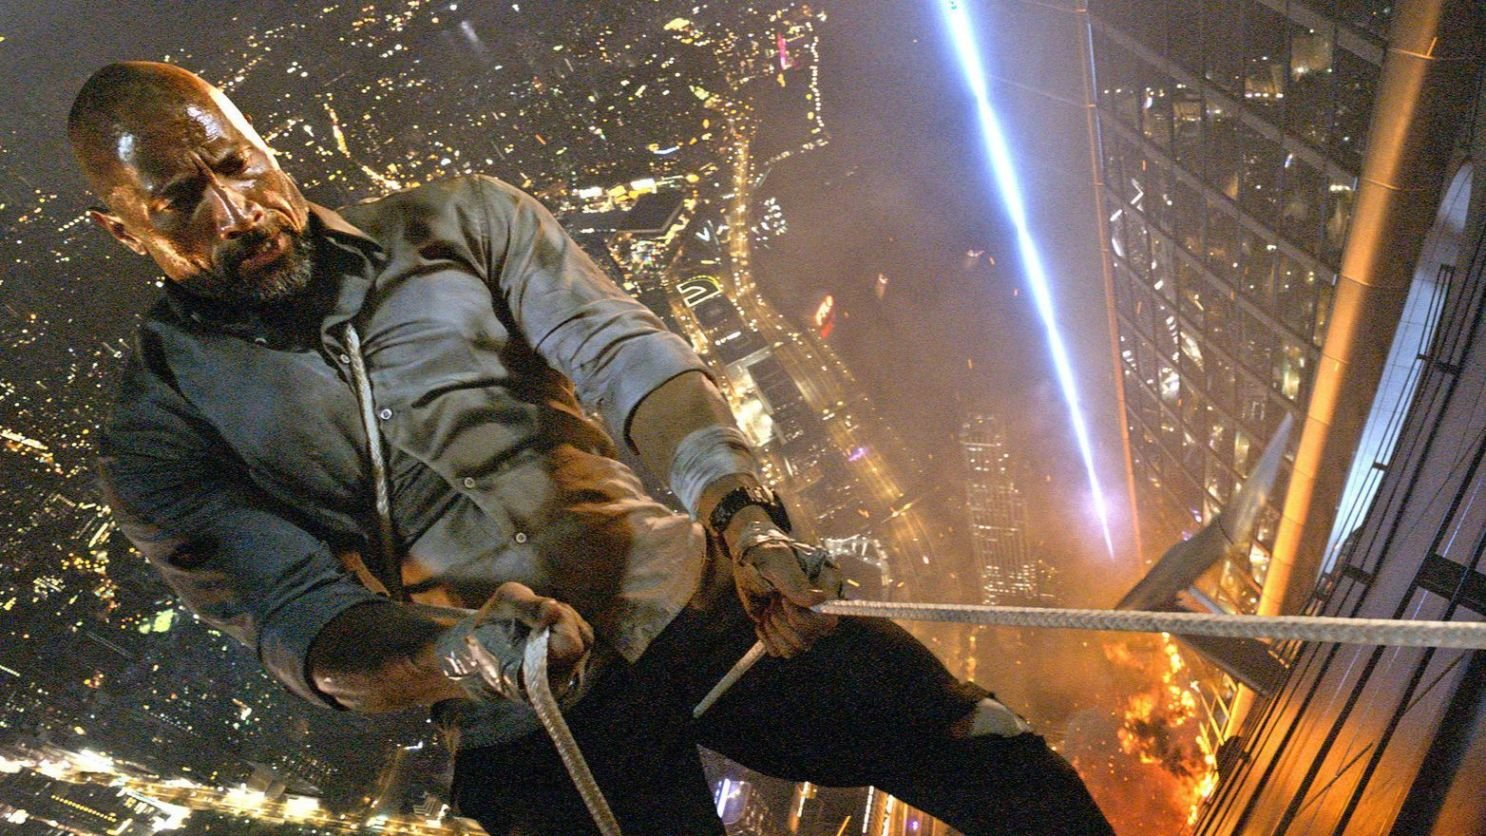 Dwayne Johnson To Save Star Wars Next